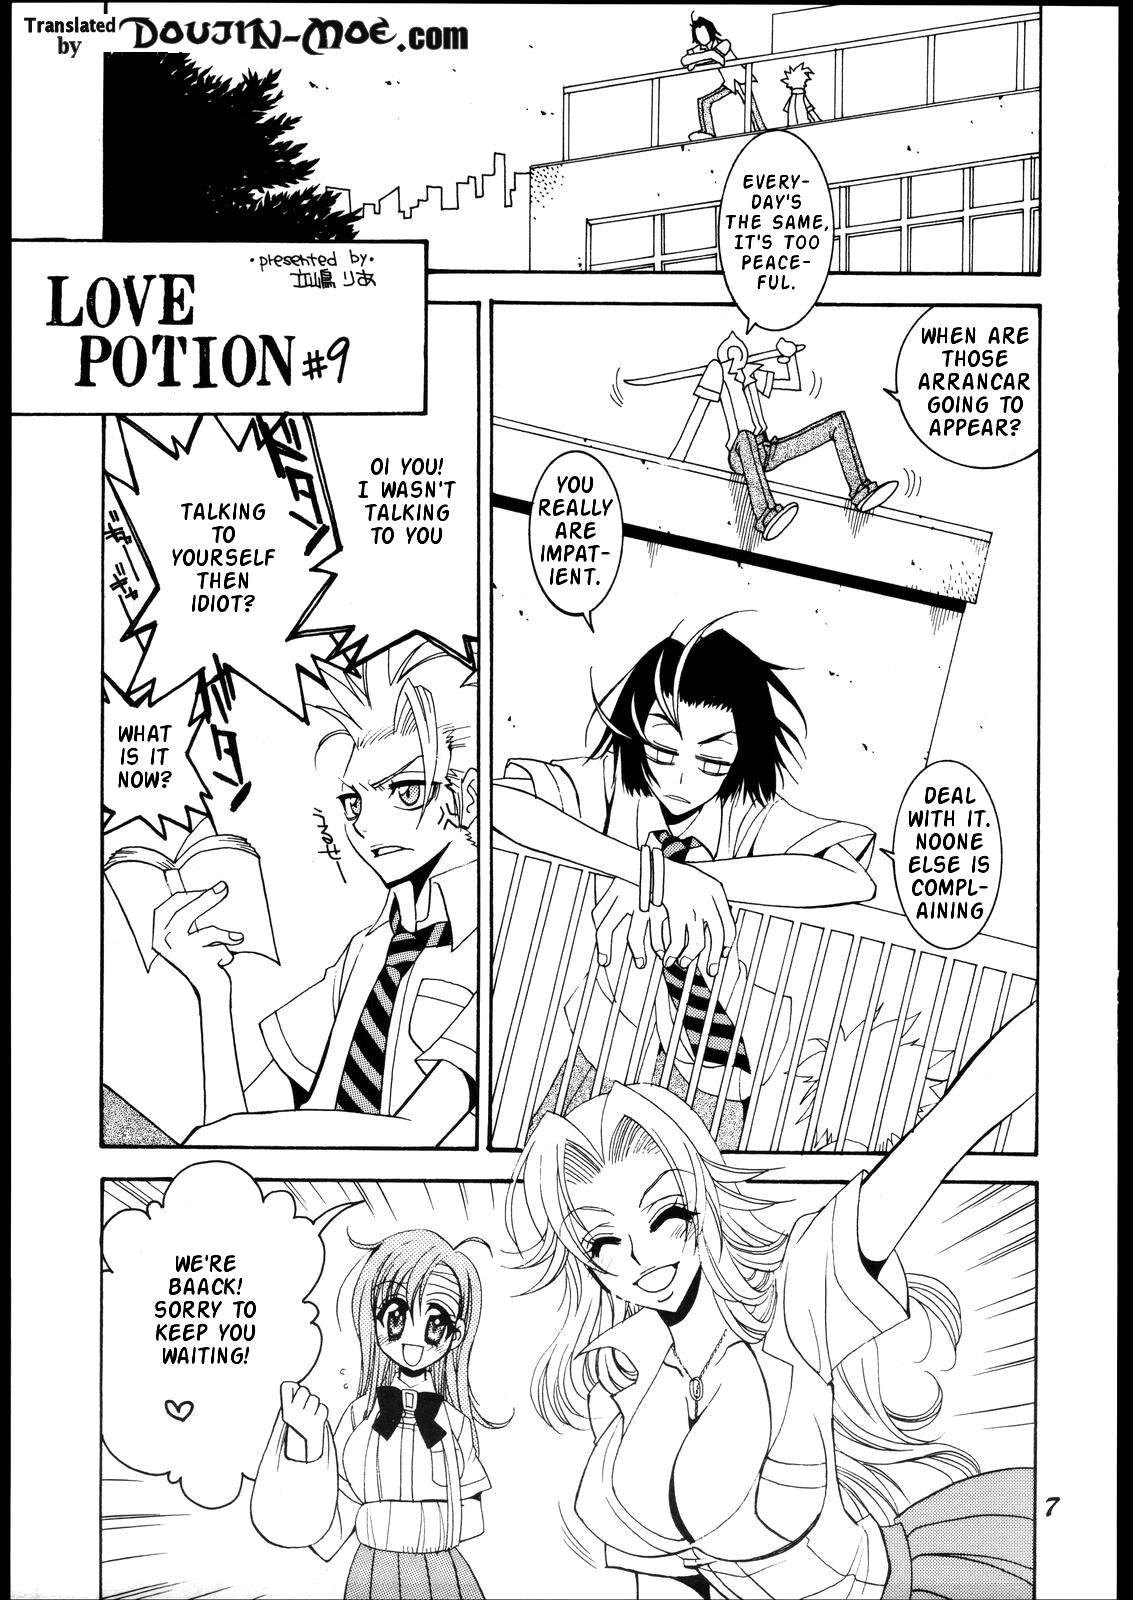 Love Potion #9 5